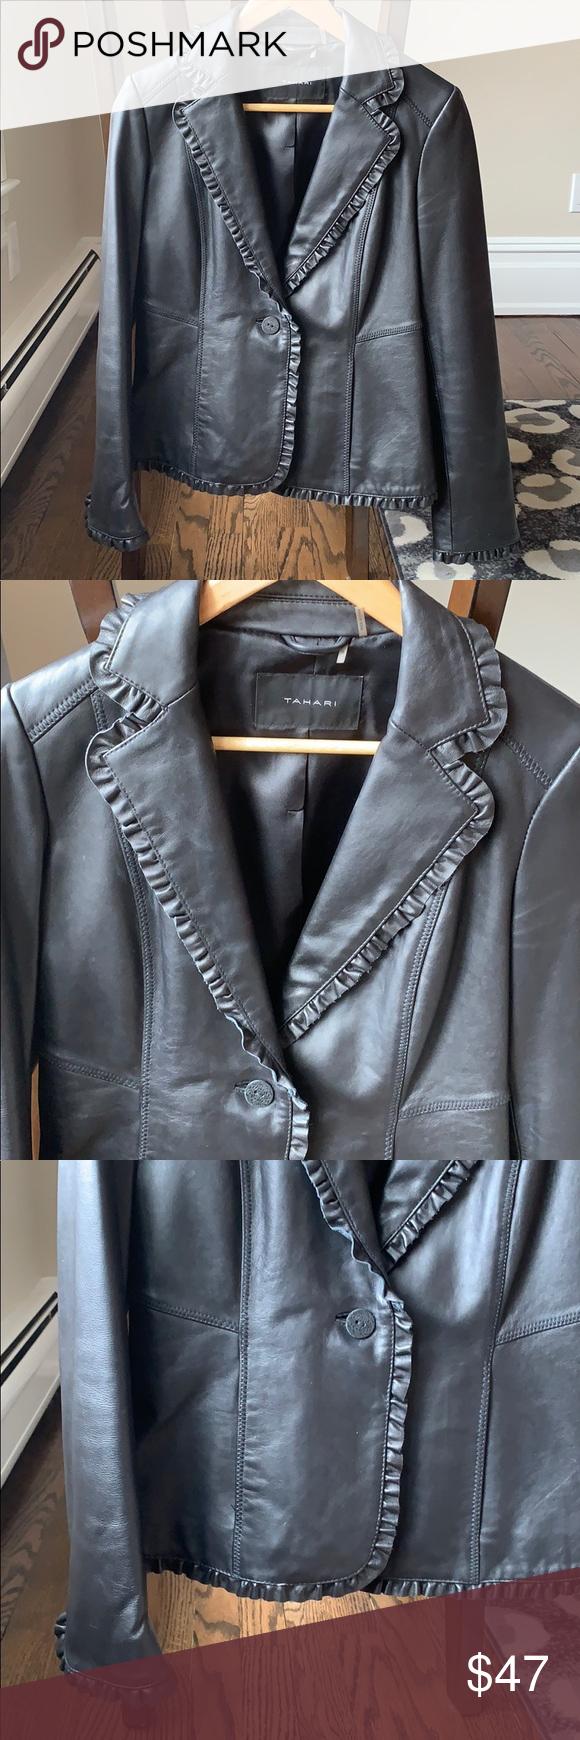 Tahari Black Leather Jacket Leather Jacket Clothes Design Black Leather Jacket [ 1740 x 580 Pixel ]